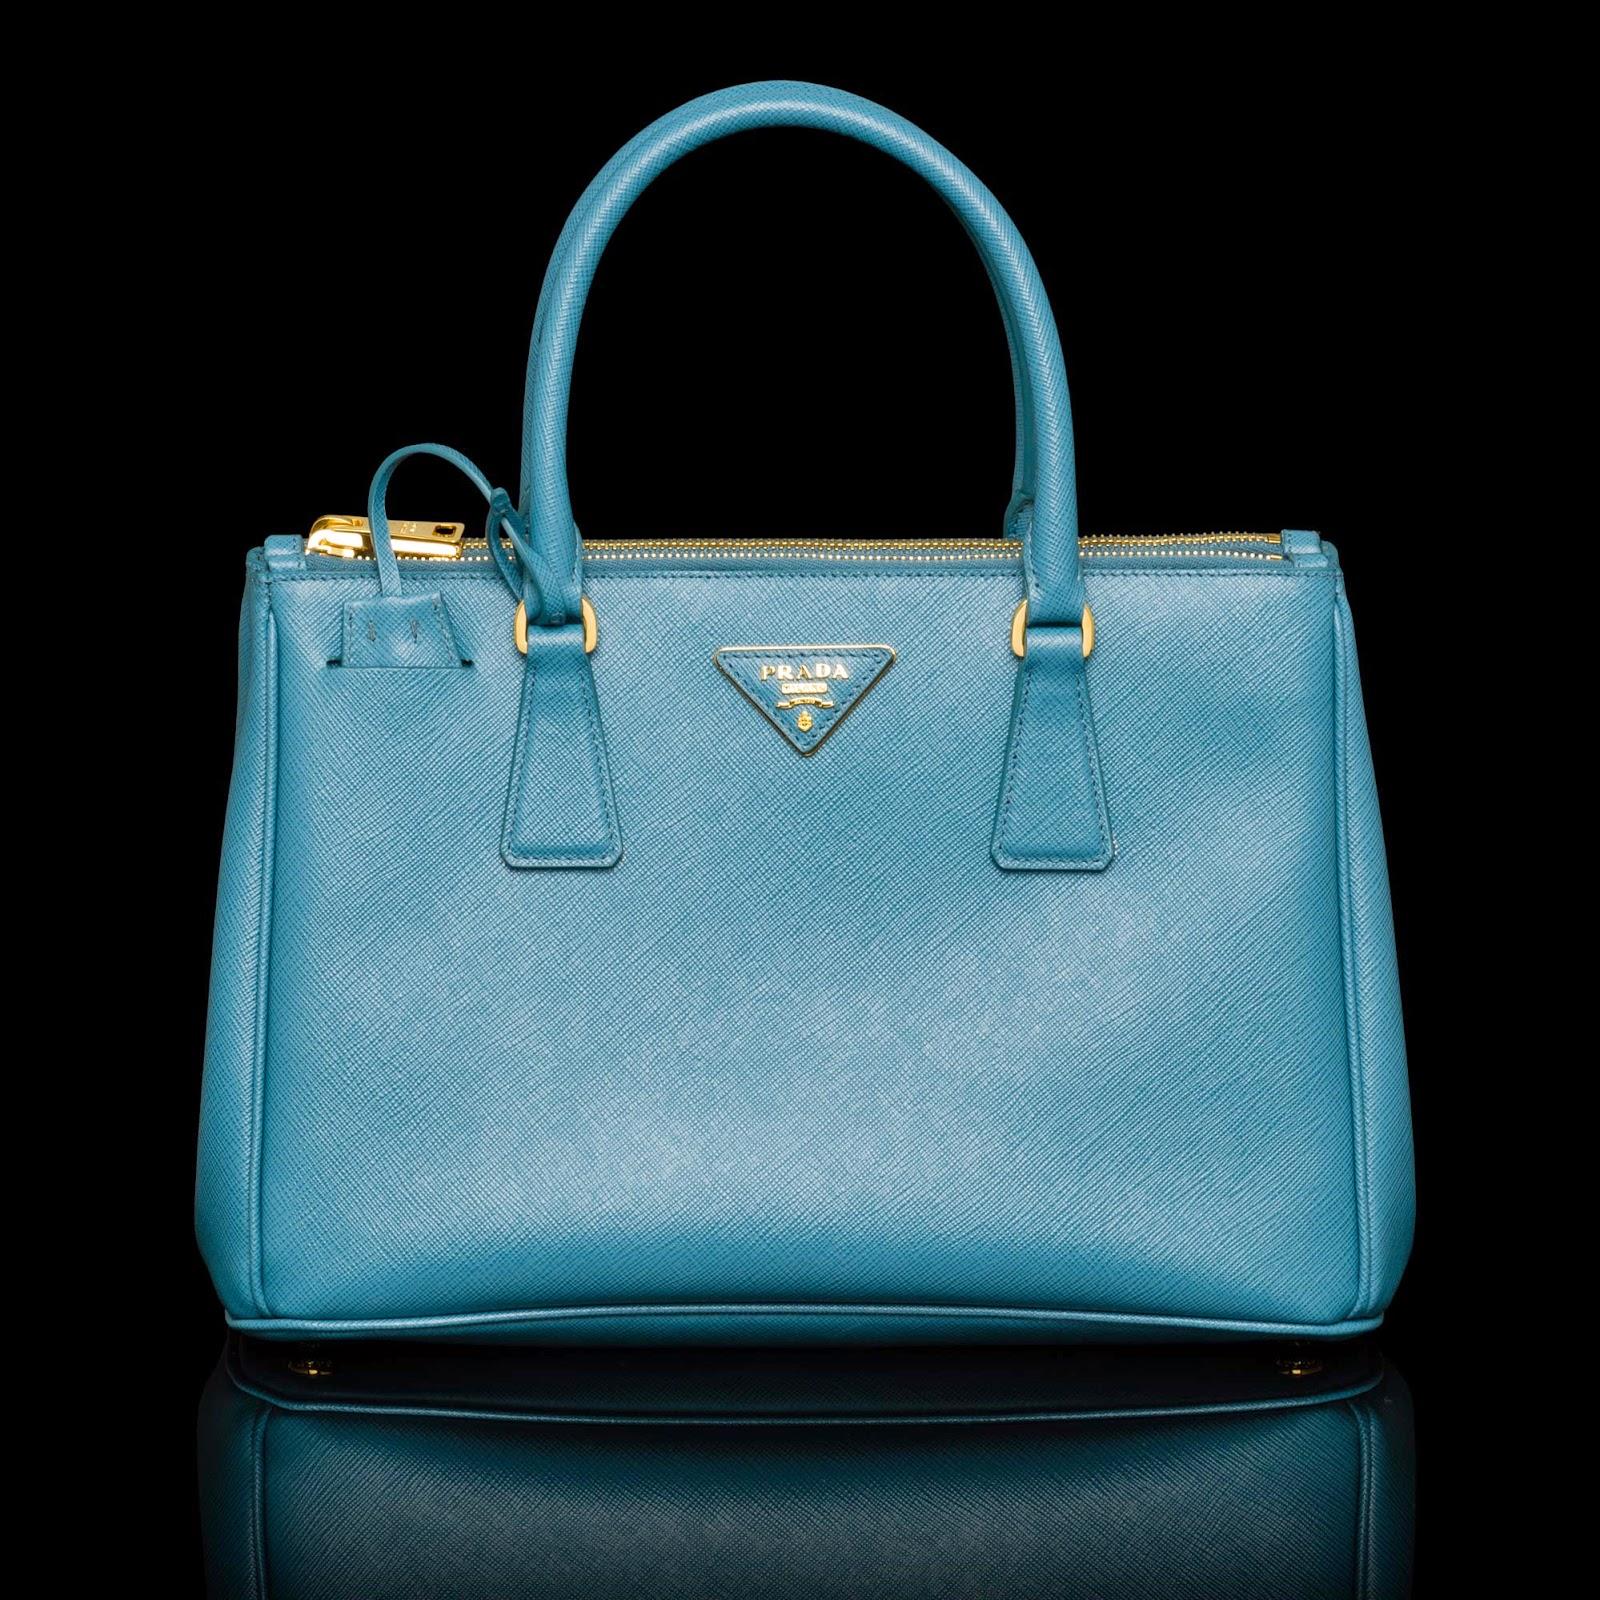 prada bags sale online - Prada Galleria Bag 1801 Saffiano Leather 30cm Dark Blue